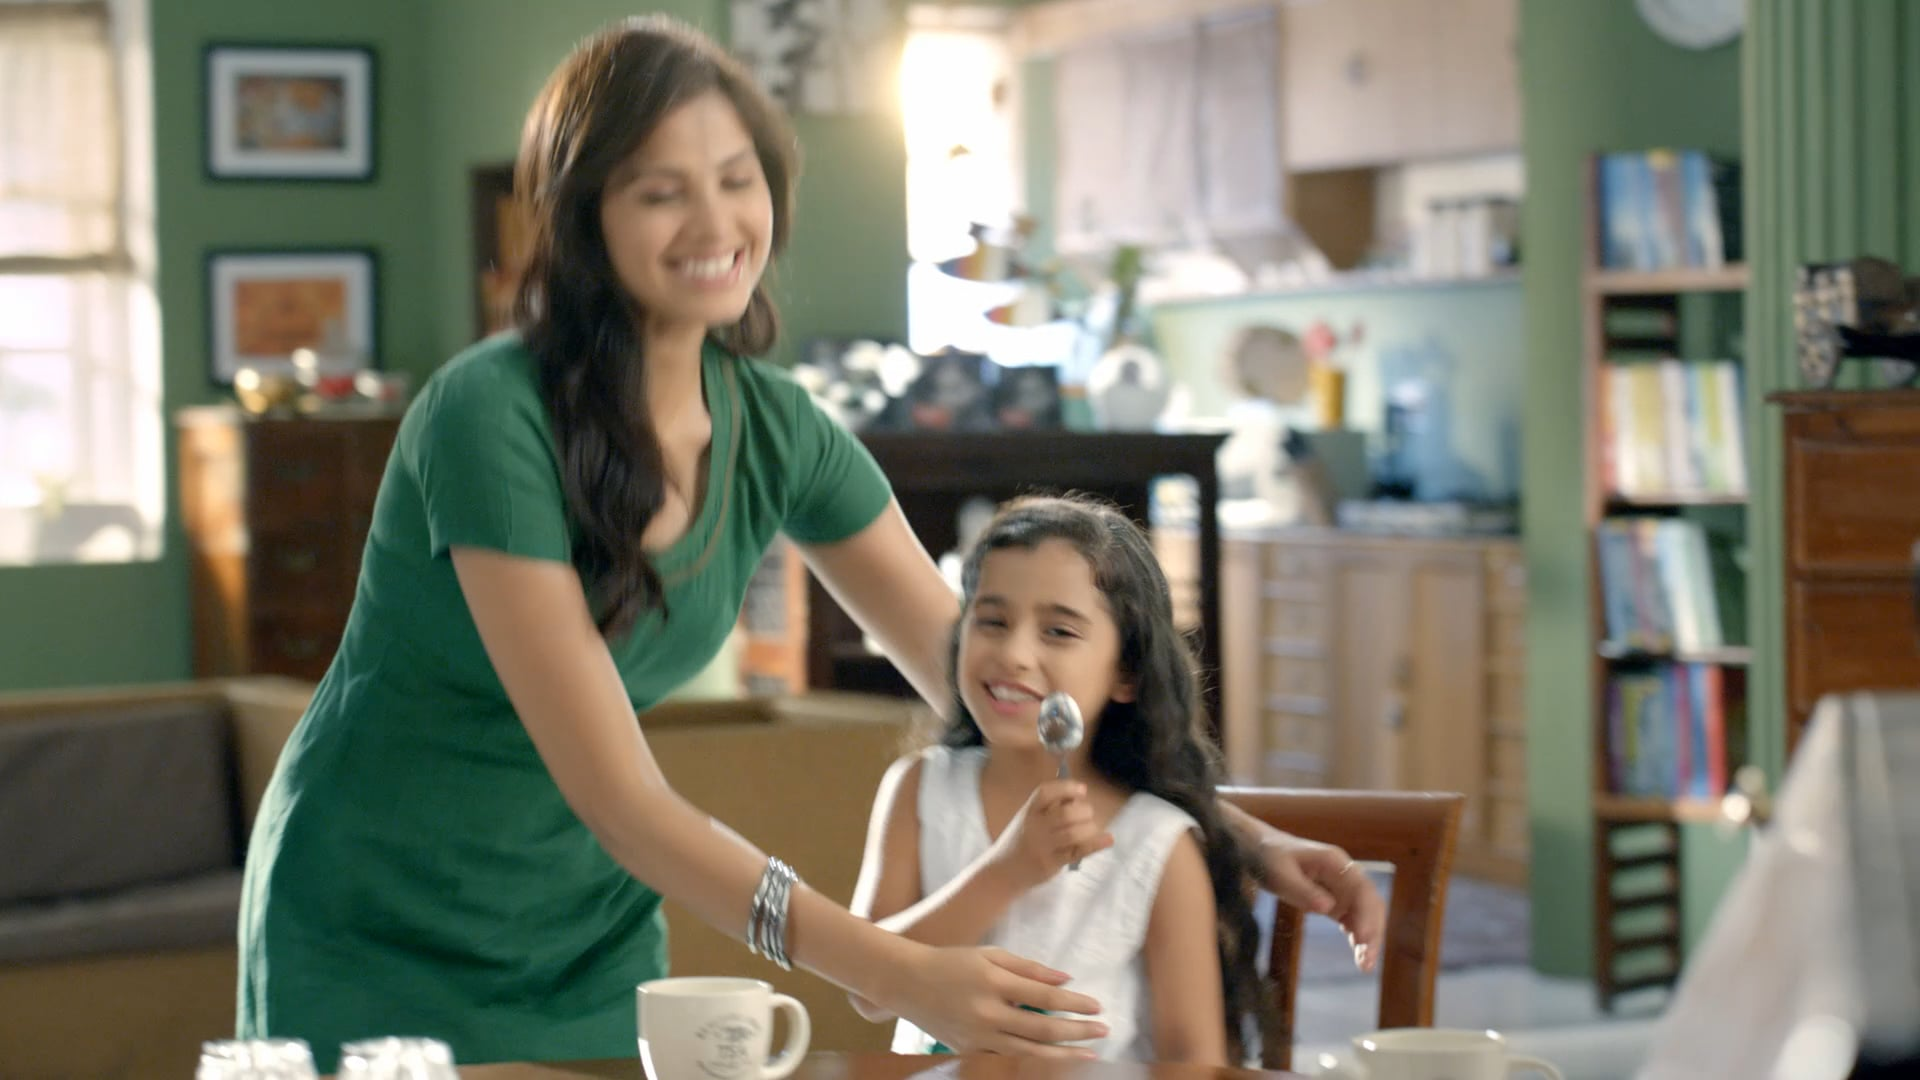 Prakash Pandurangan-Chandrika Soap Spoon Offer